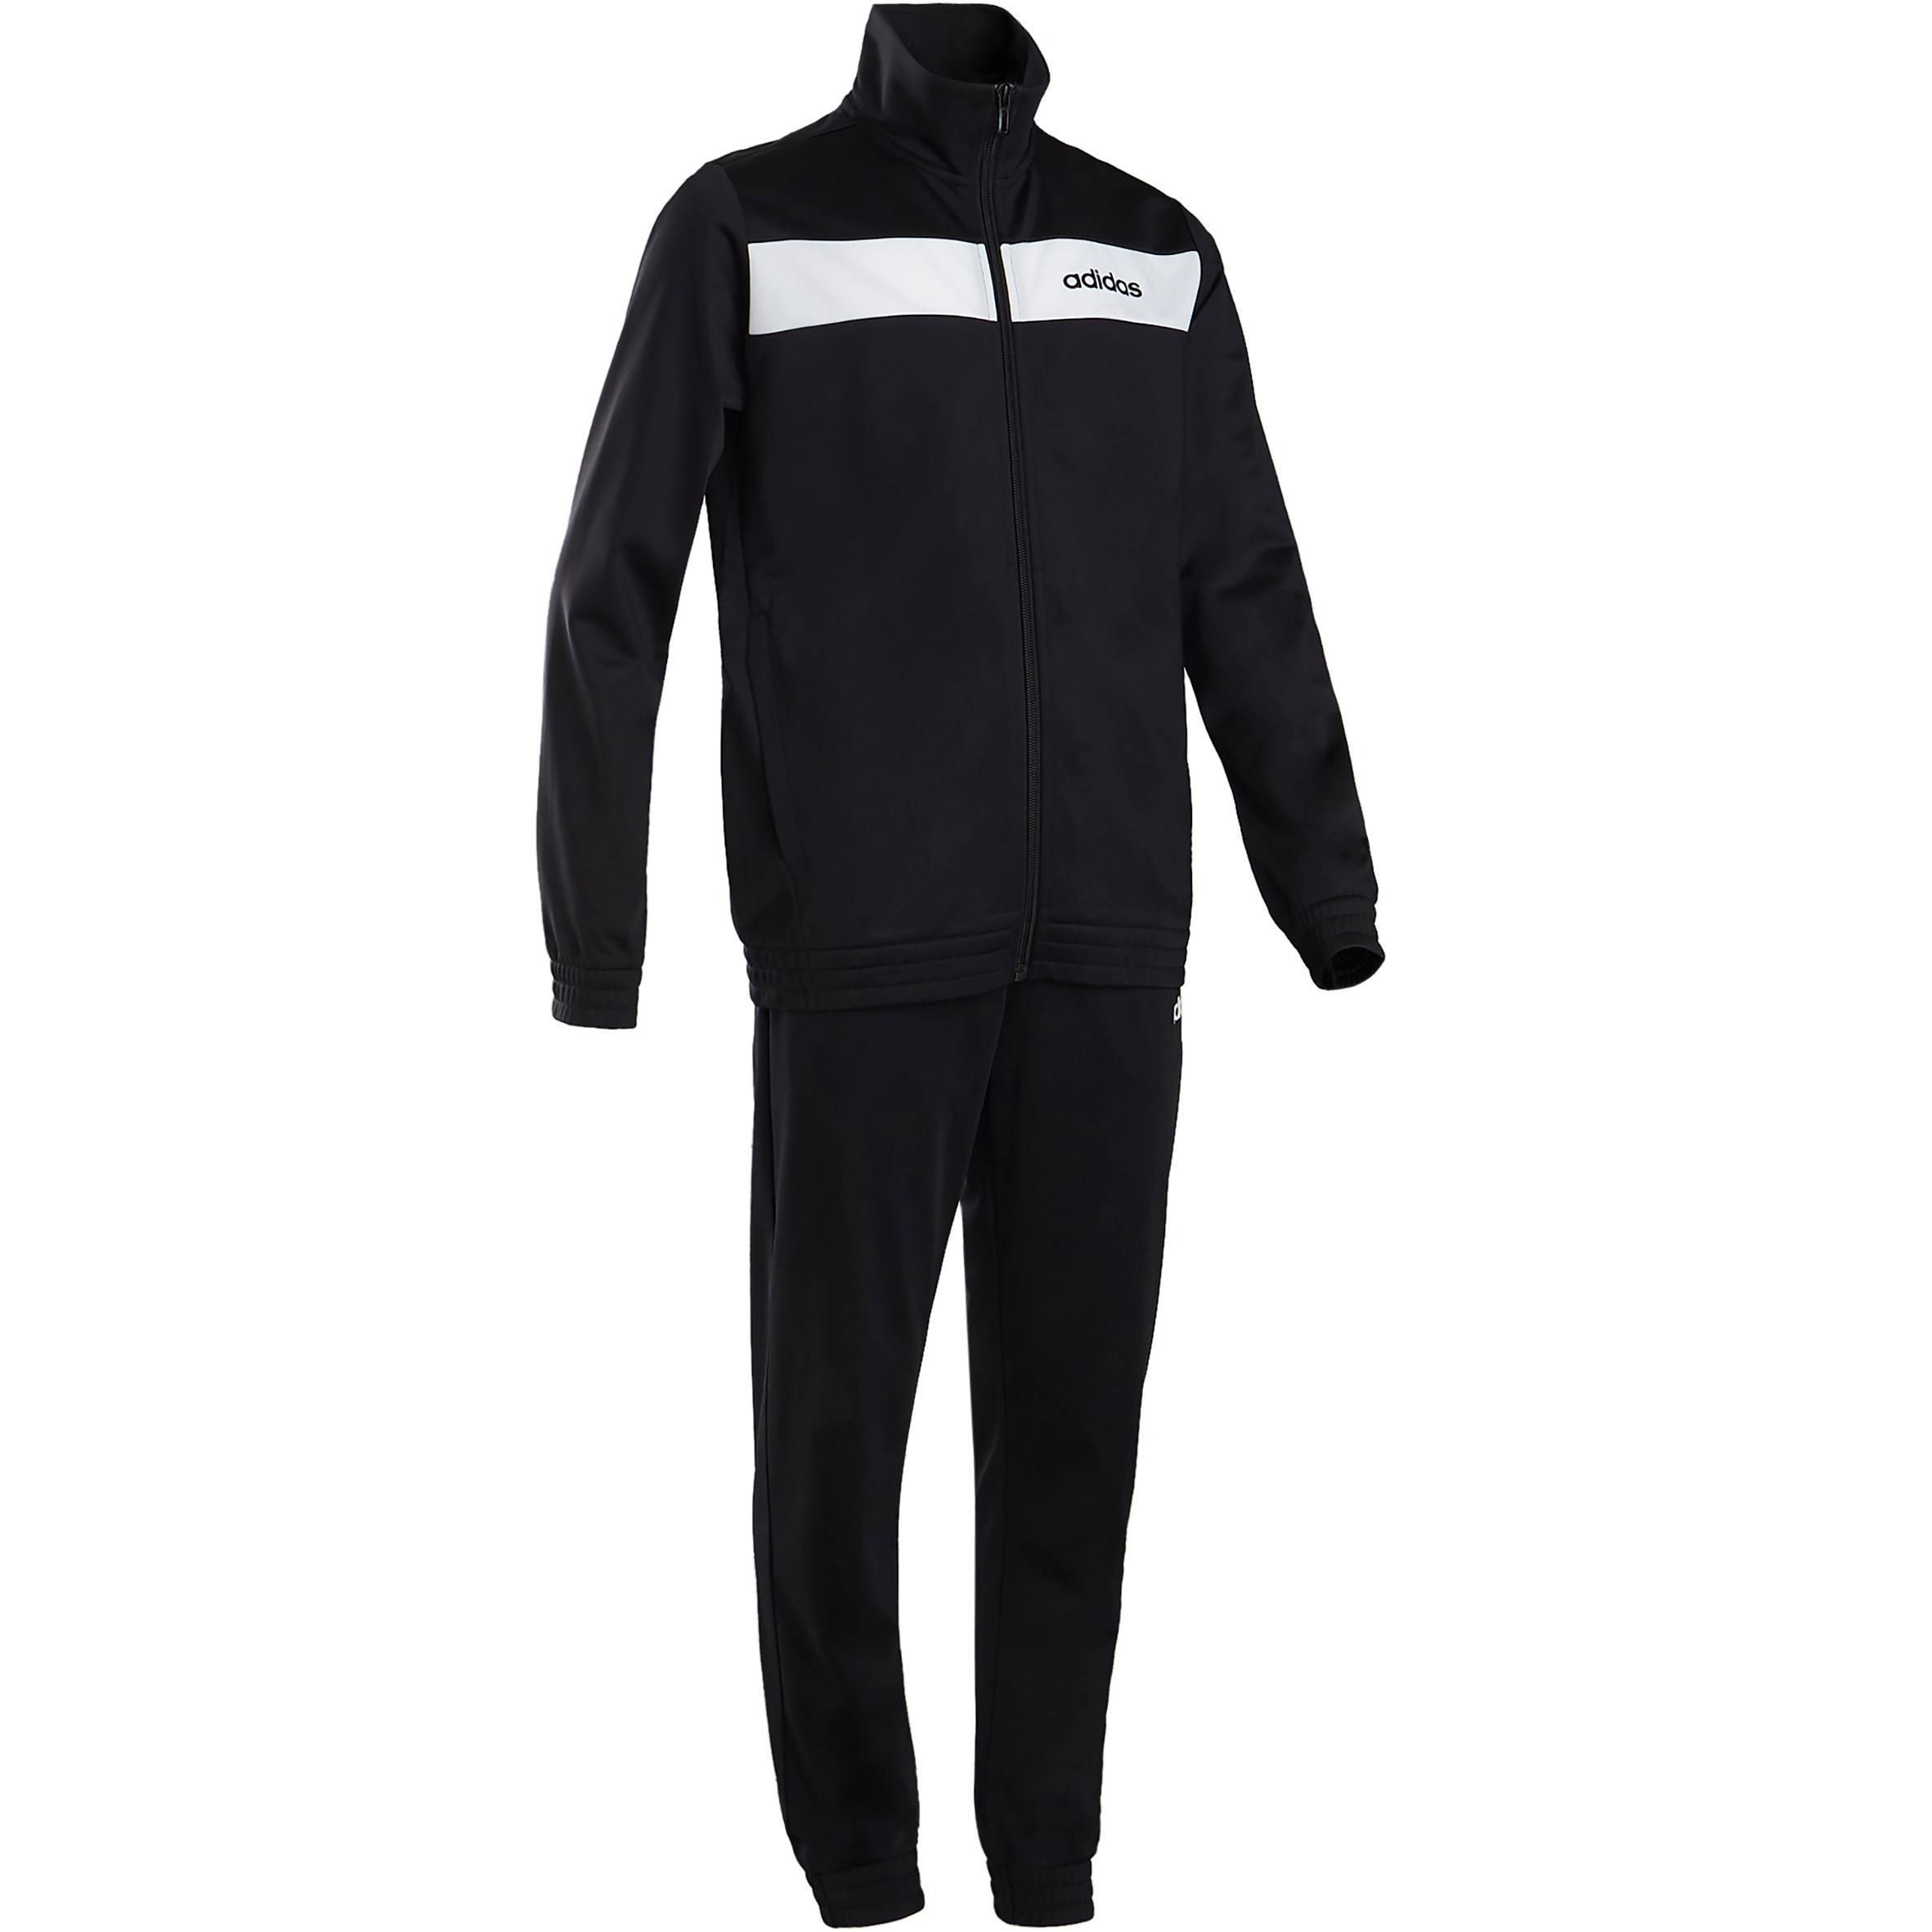 detailed look entire collection outlet on sale Trainingsanzug Kinder | Adidas, Puma, Domyos | DECATHLON